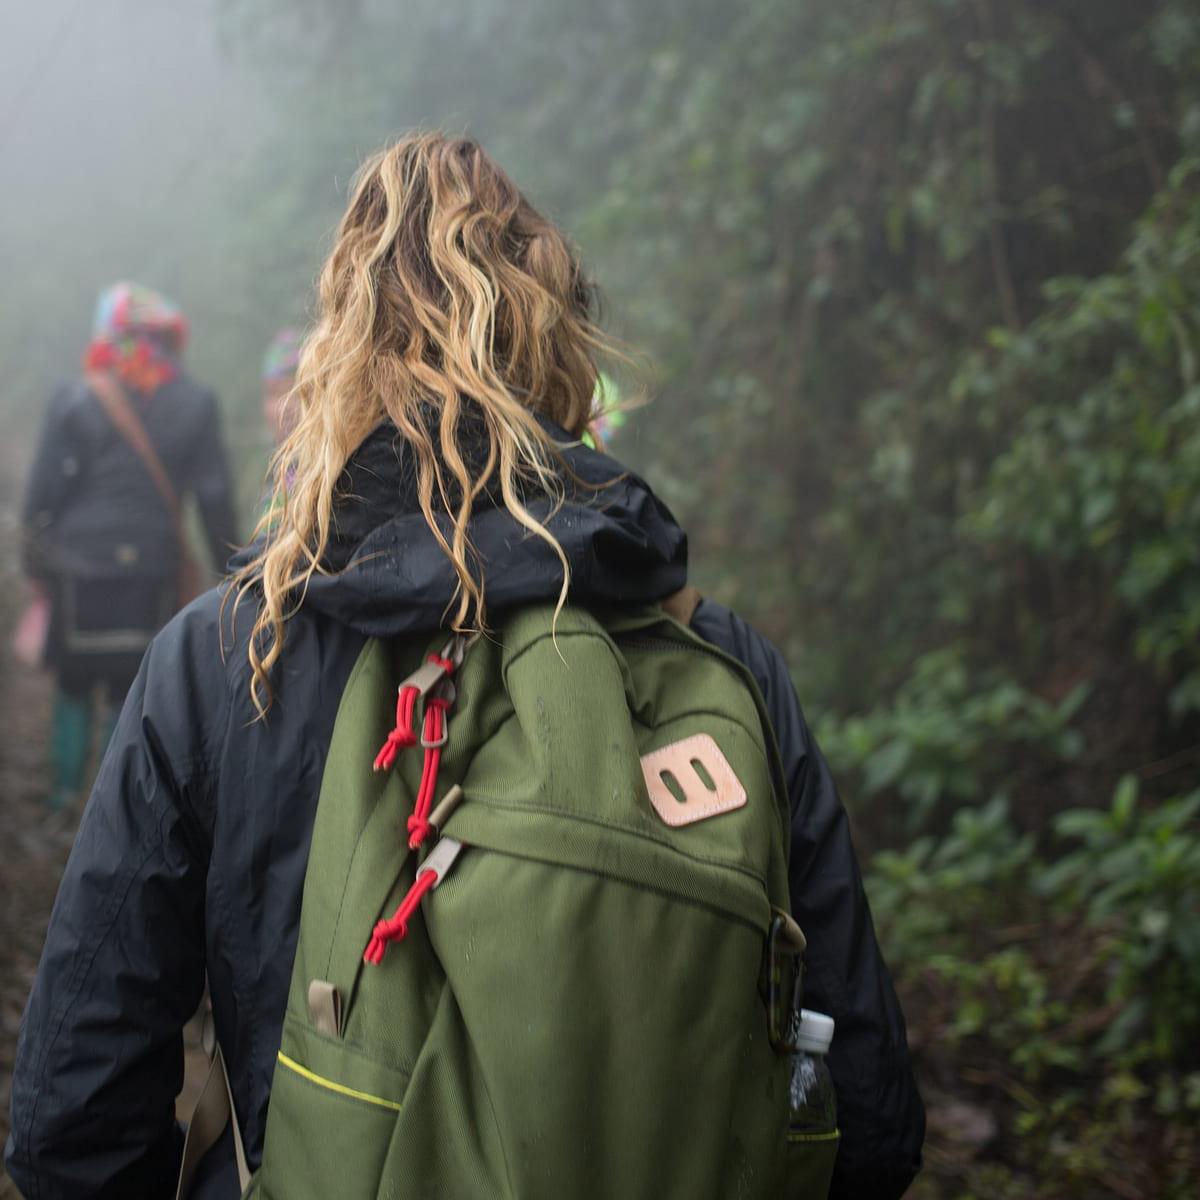 Topo Designs Daypack backpack Olive, ook op vakantie je beste vriend